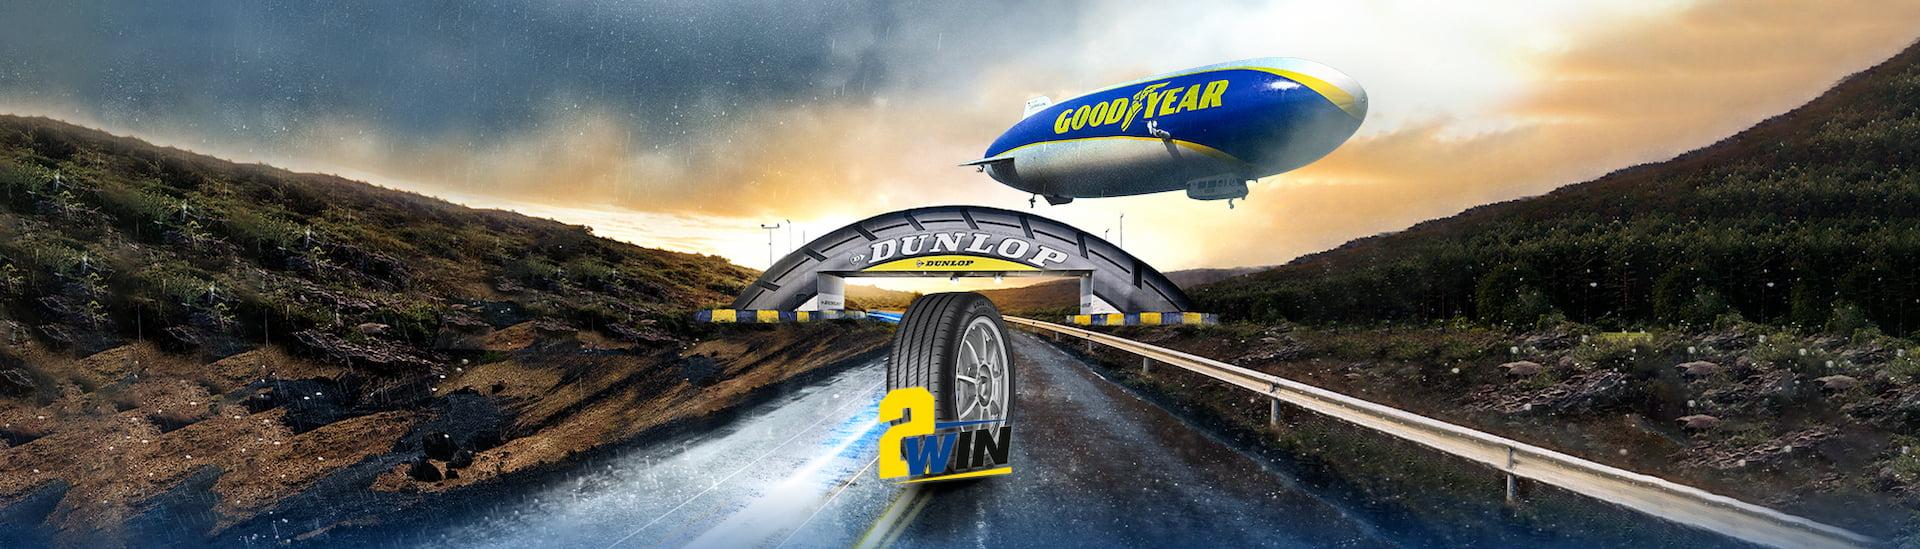 Goodyear 2 Win - Dunlop 2 Win